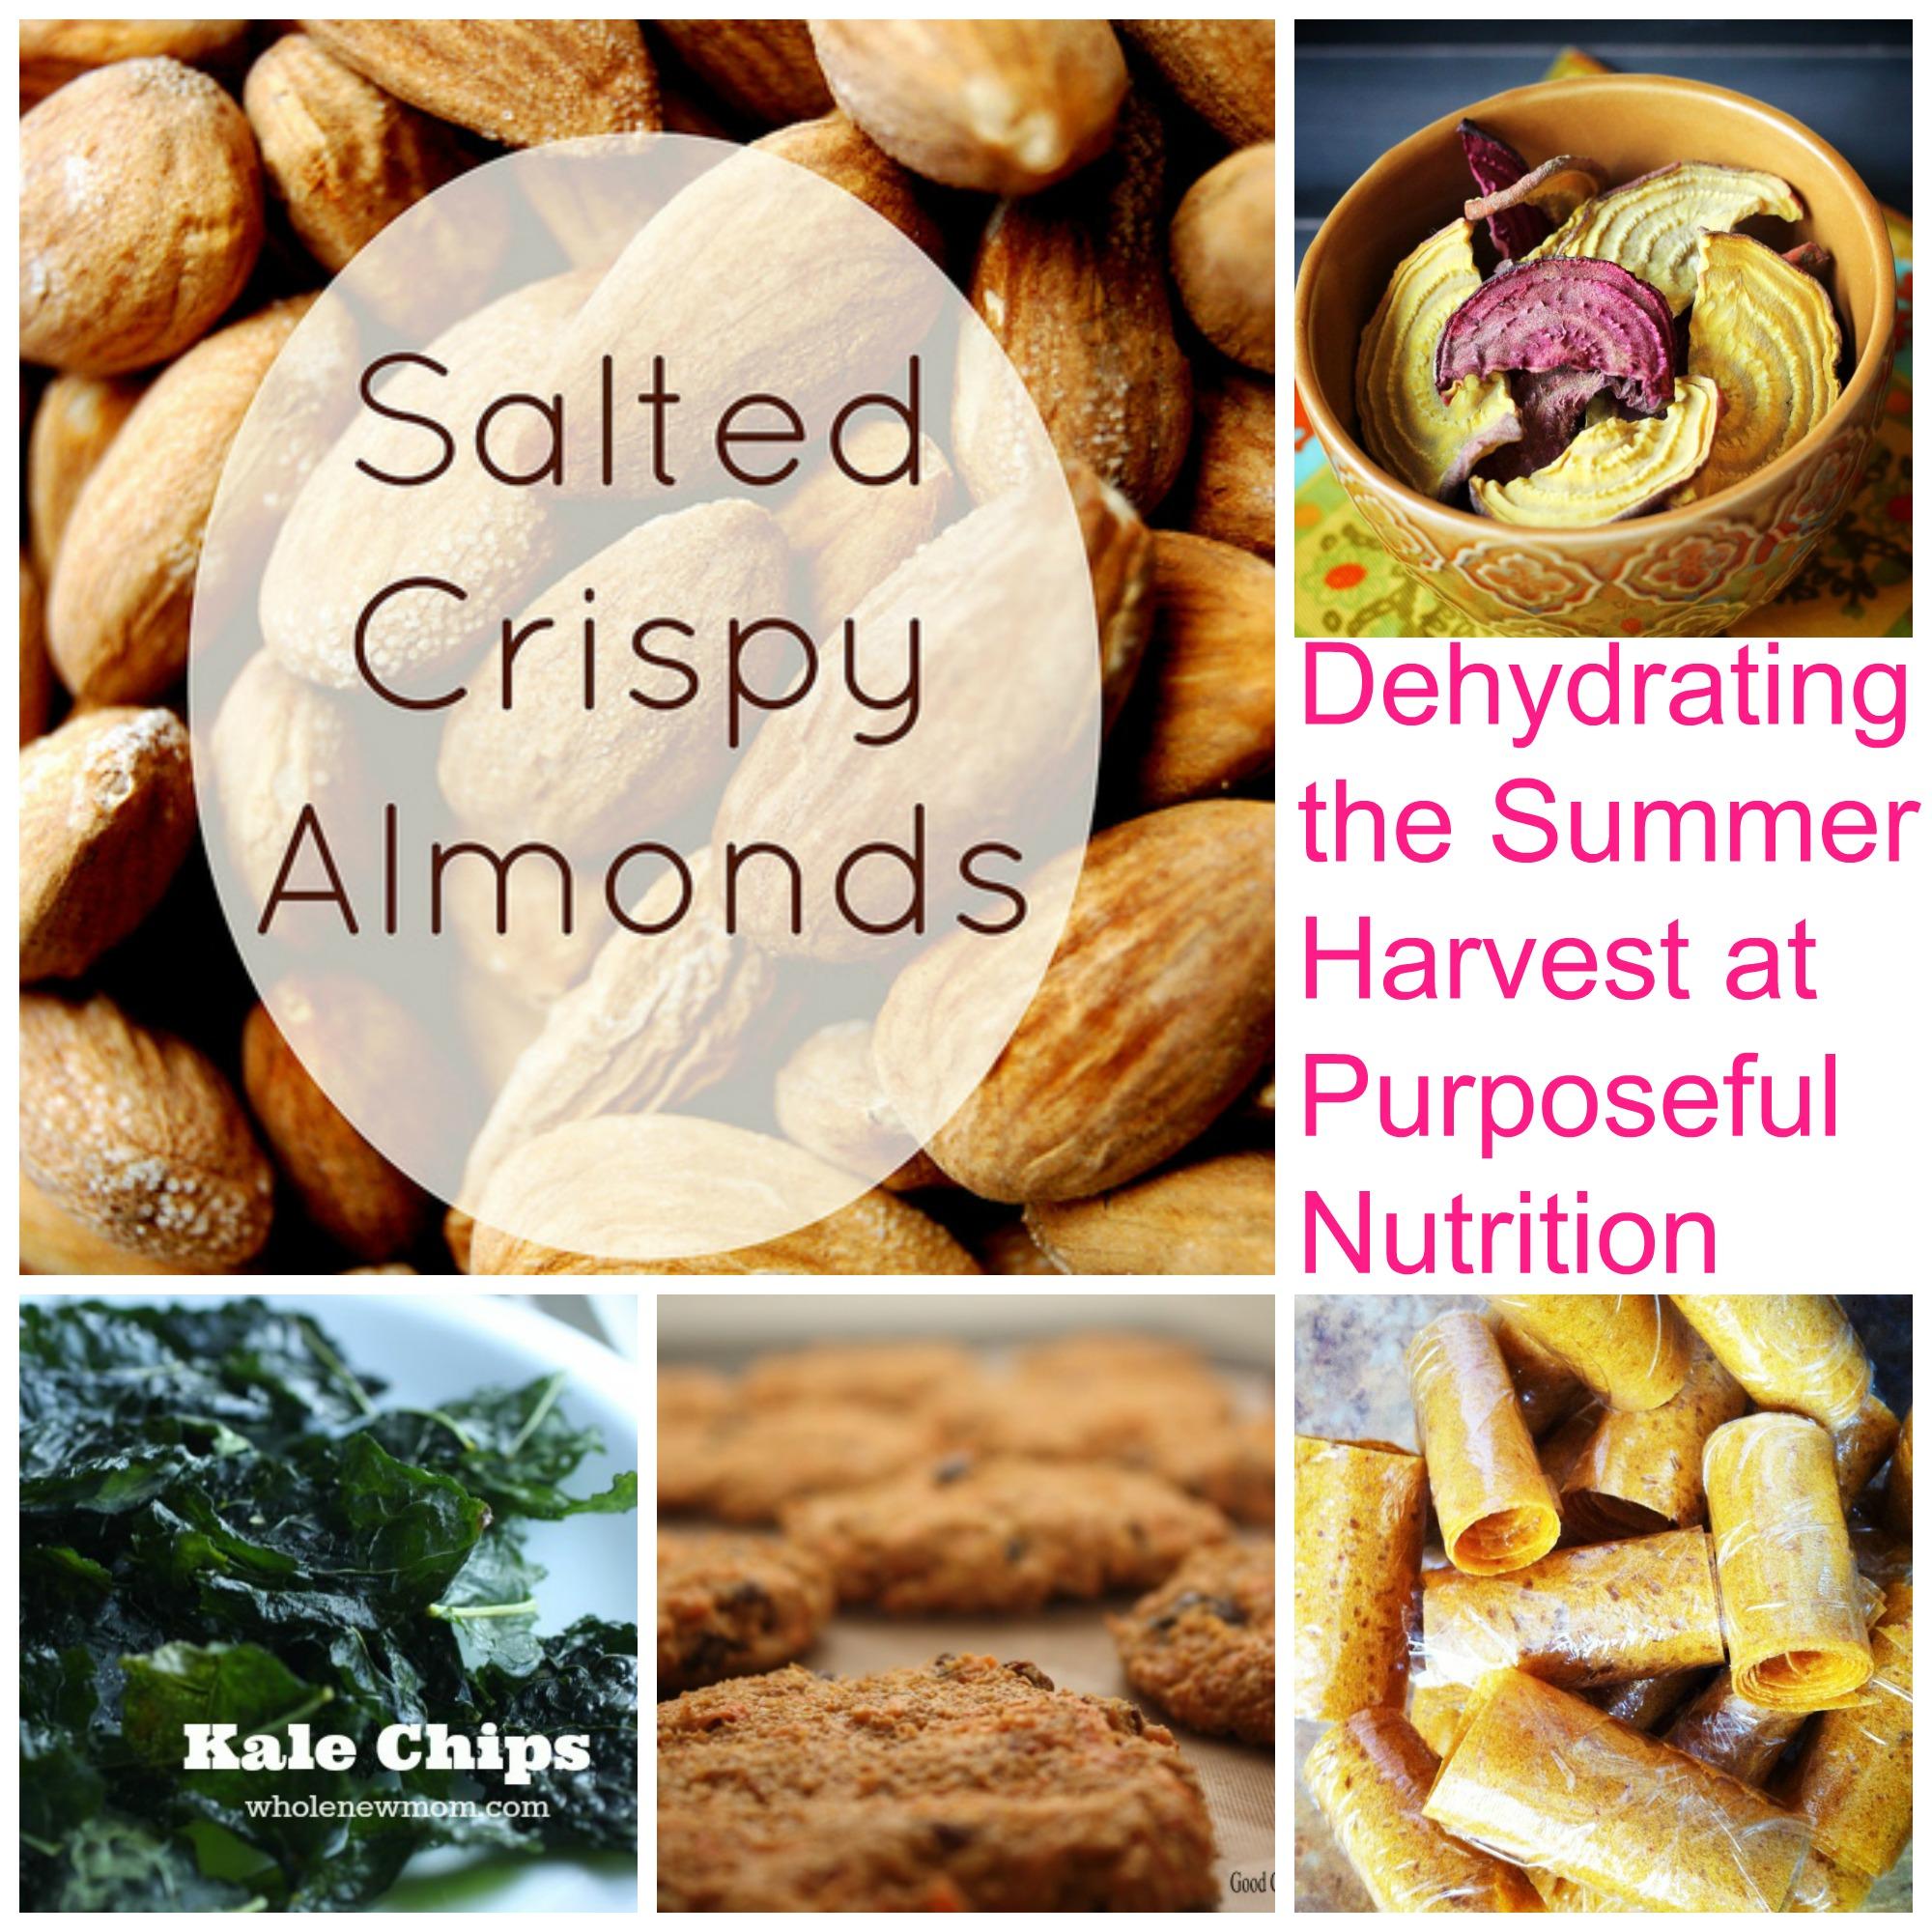 Dehydrating the Summer Harvest:  Purposeful Nutrition